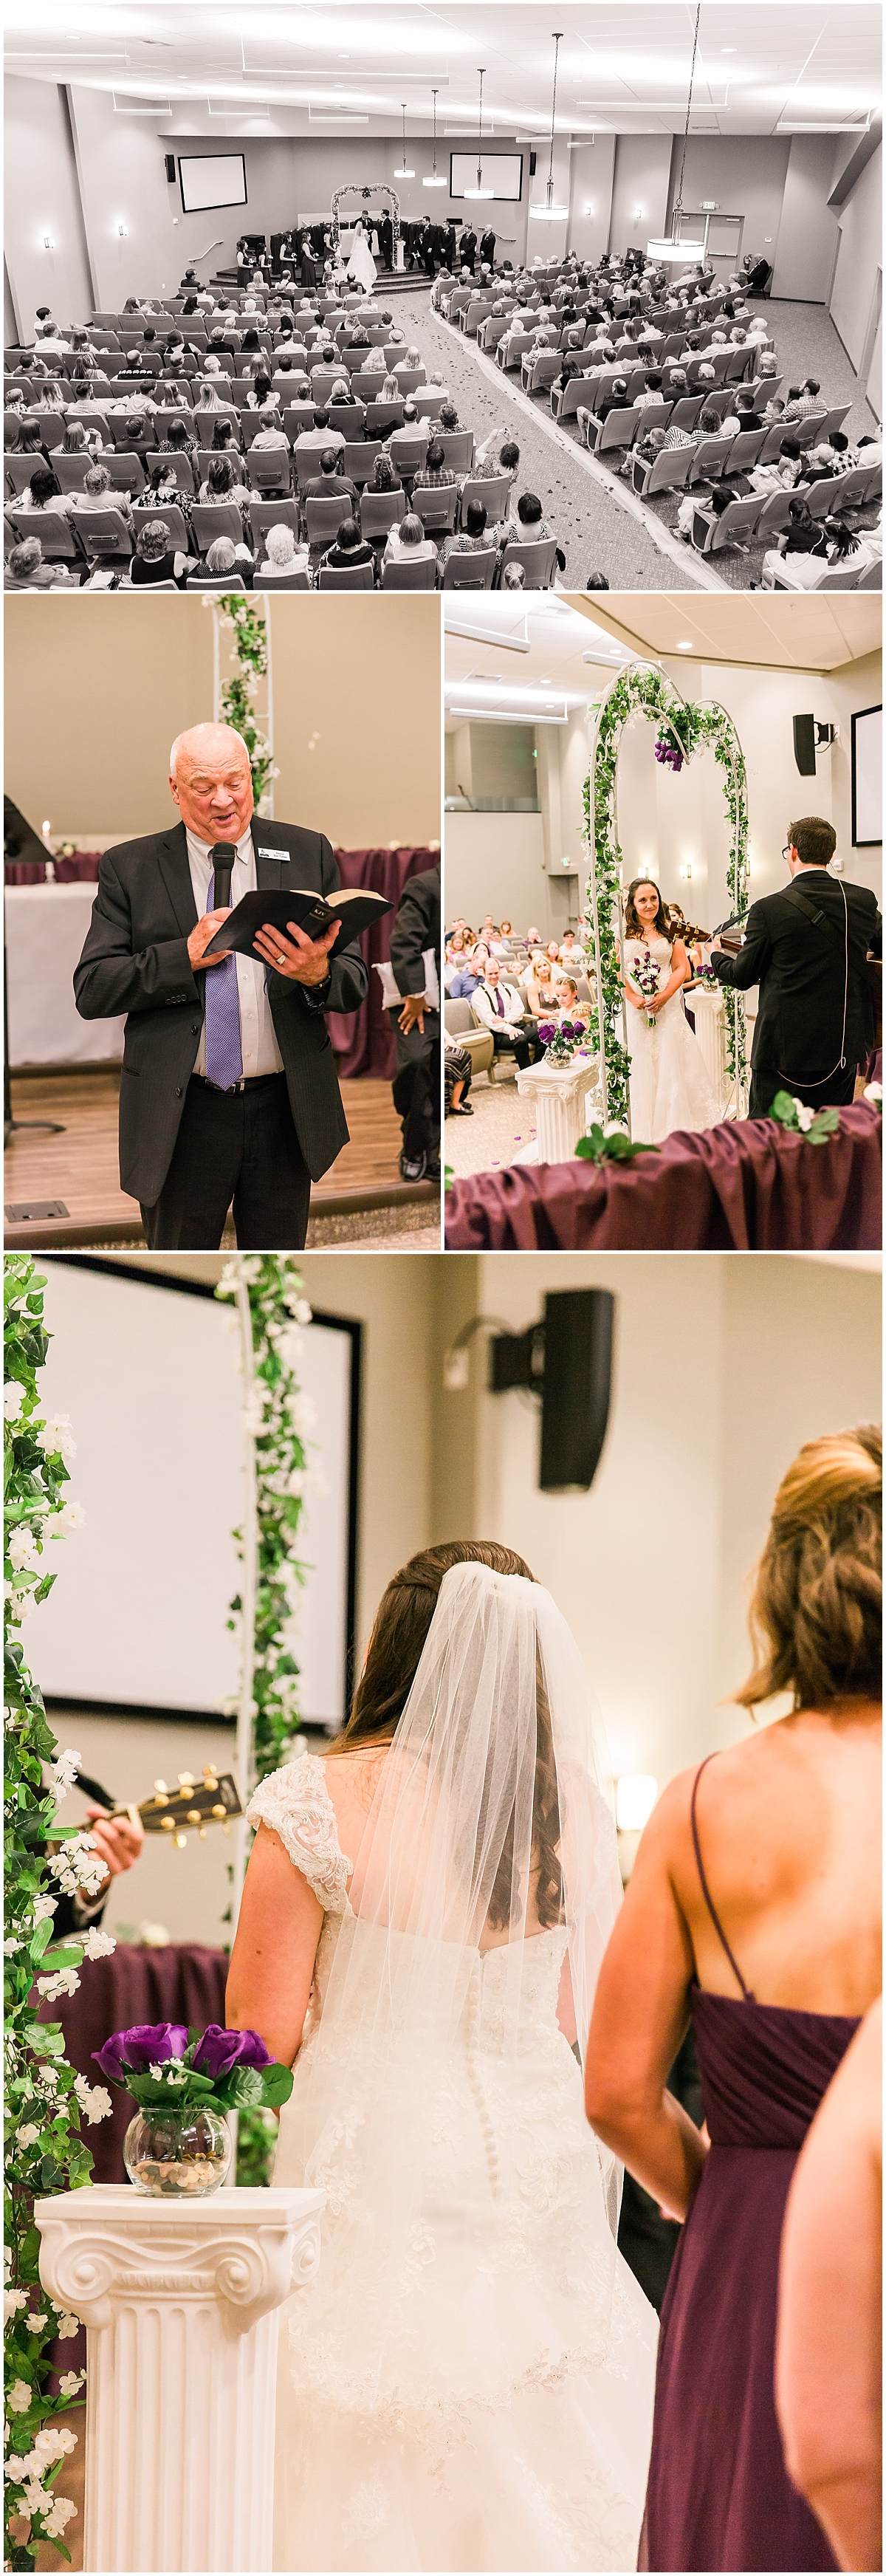 spokane church wedding